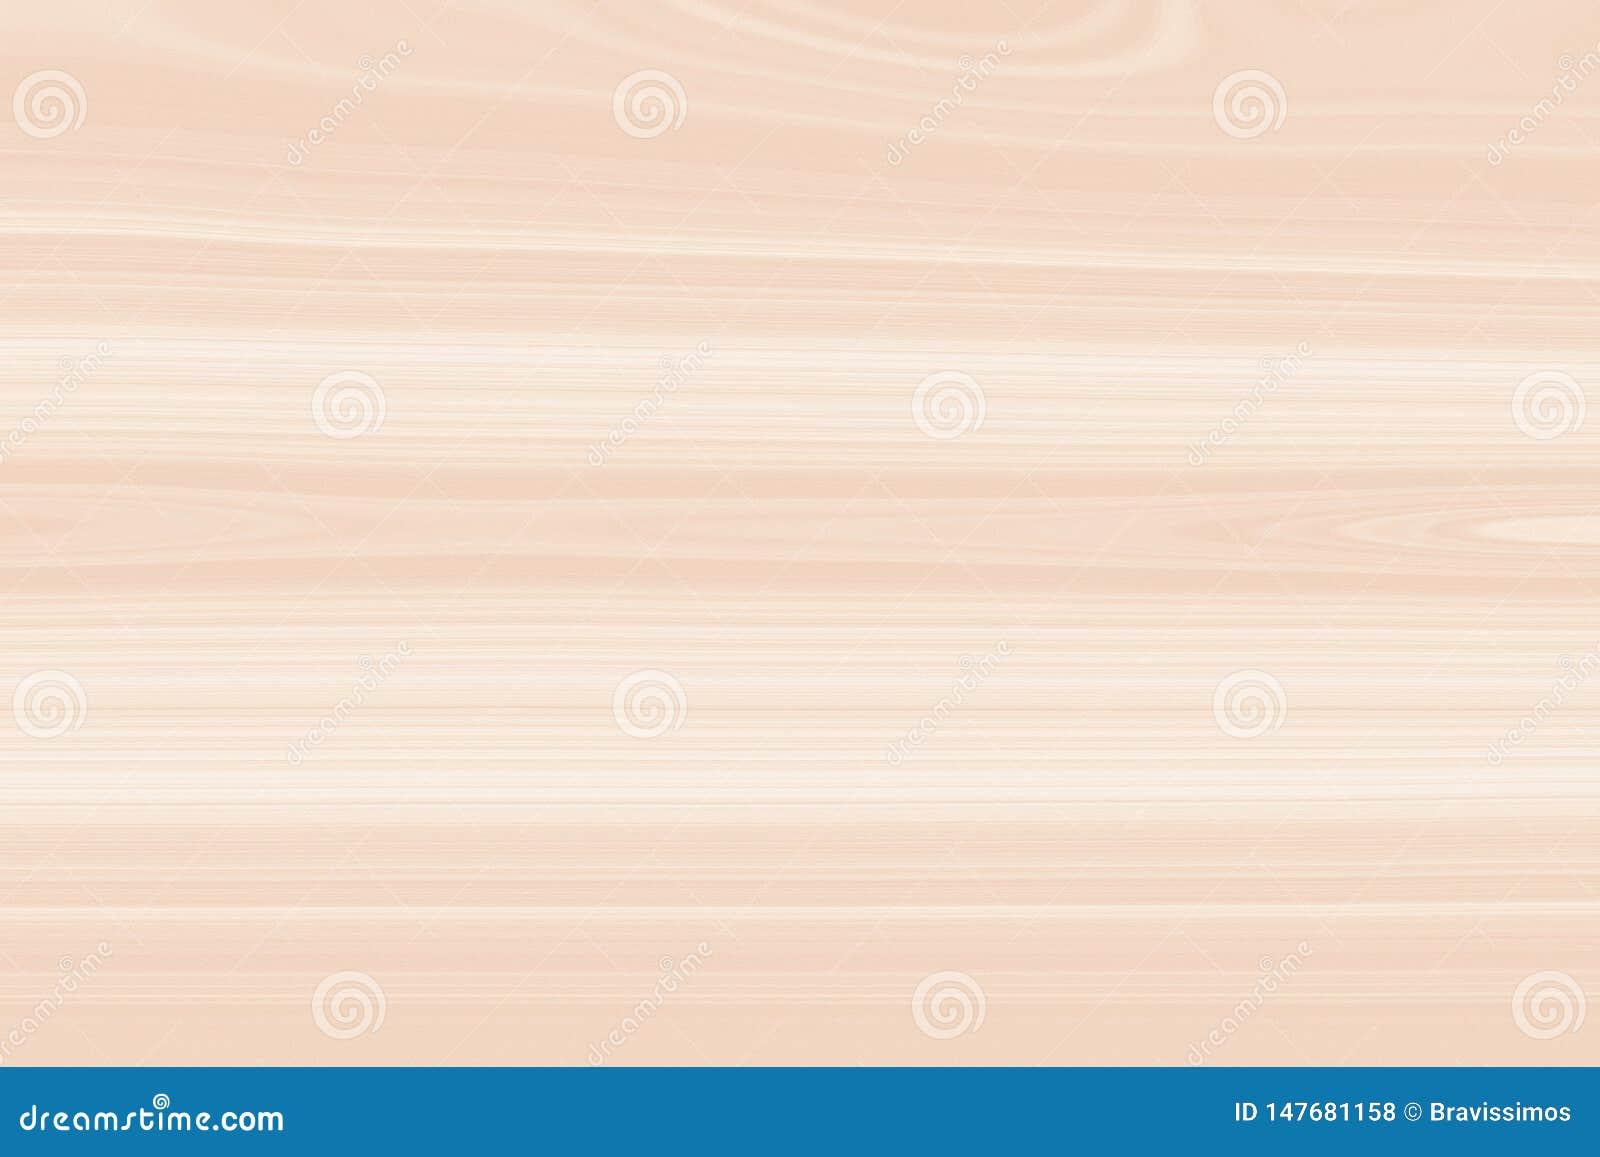 Reddish brown wood background pattern, wallpaper